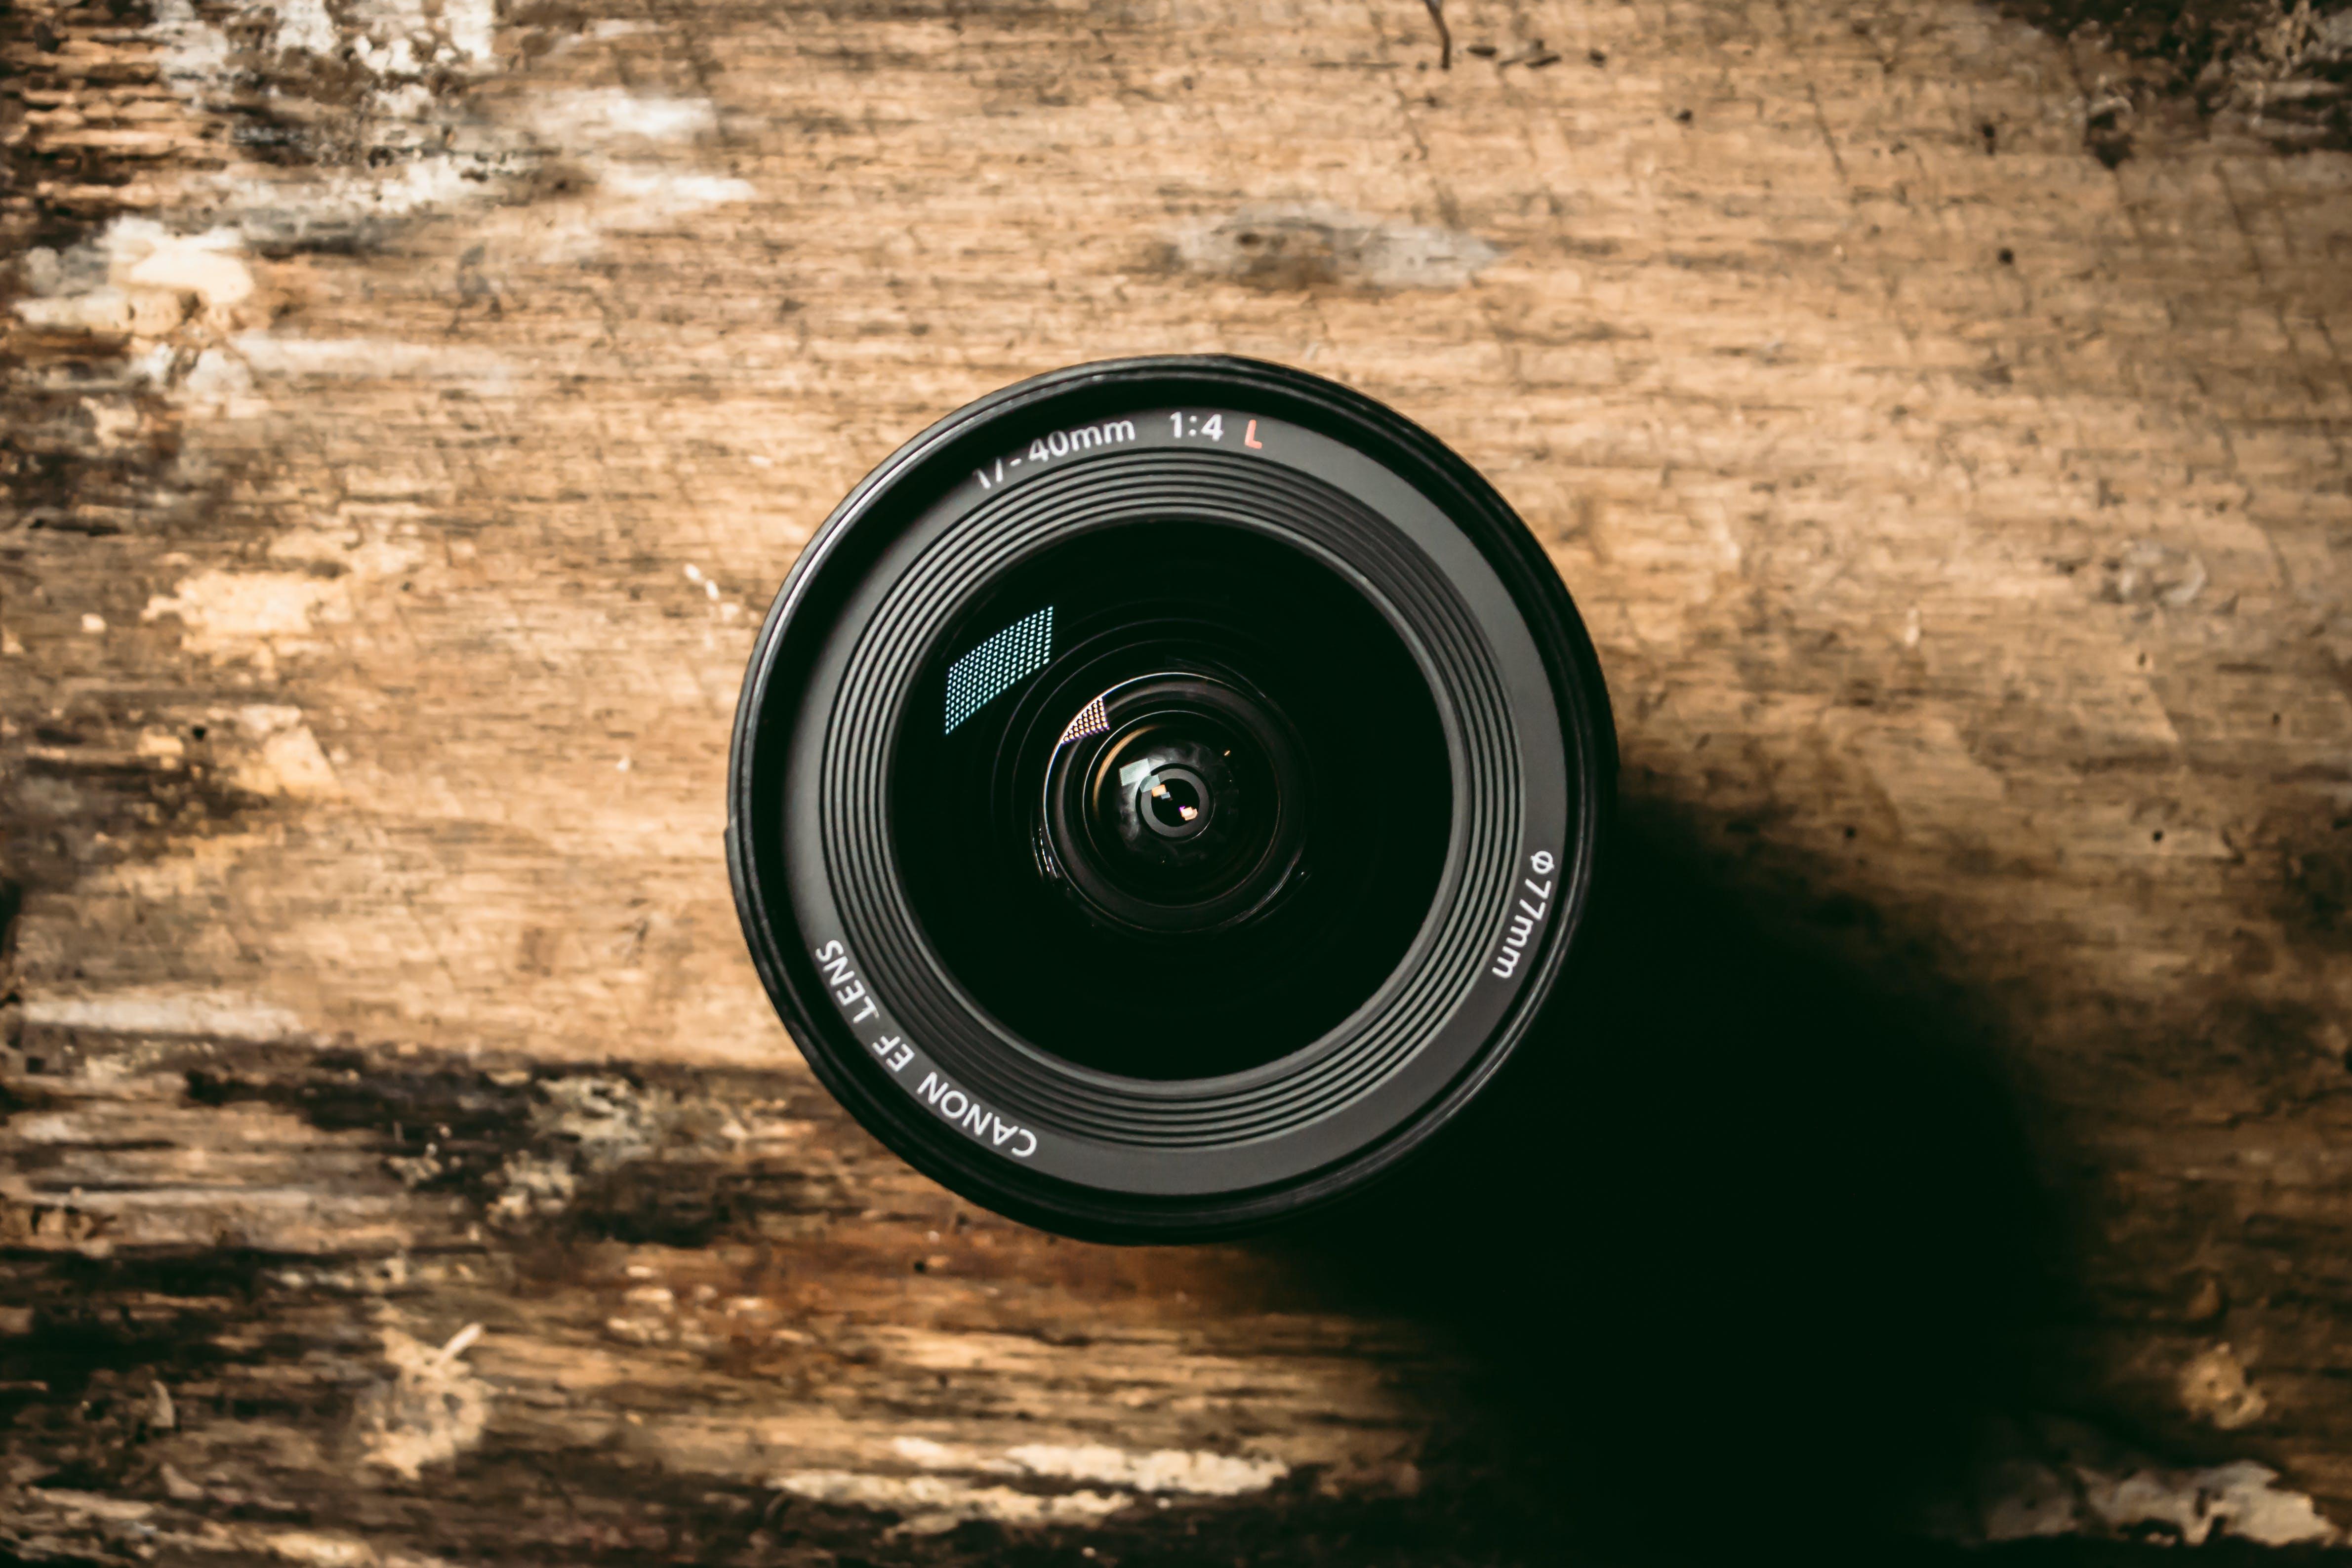 Free stock photo of camera, camera equipment, camera lens, canon